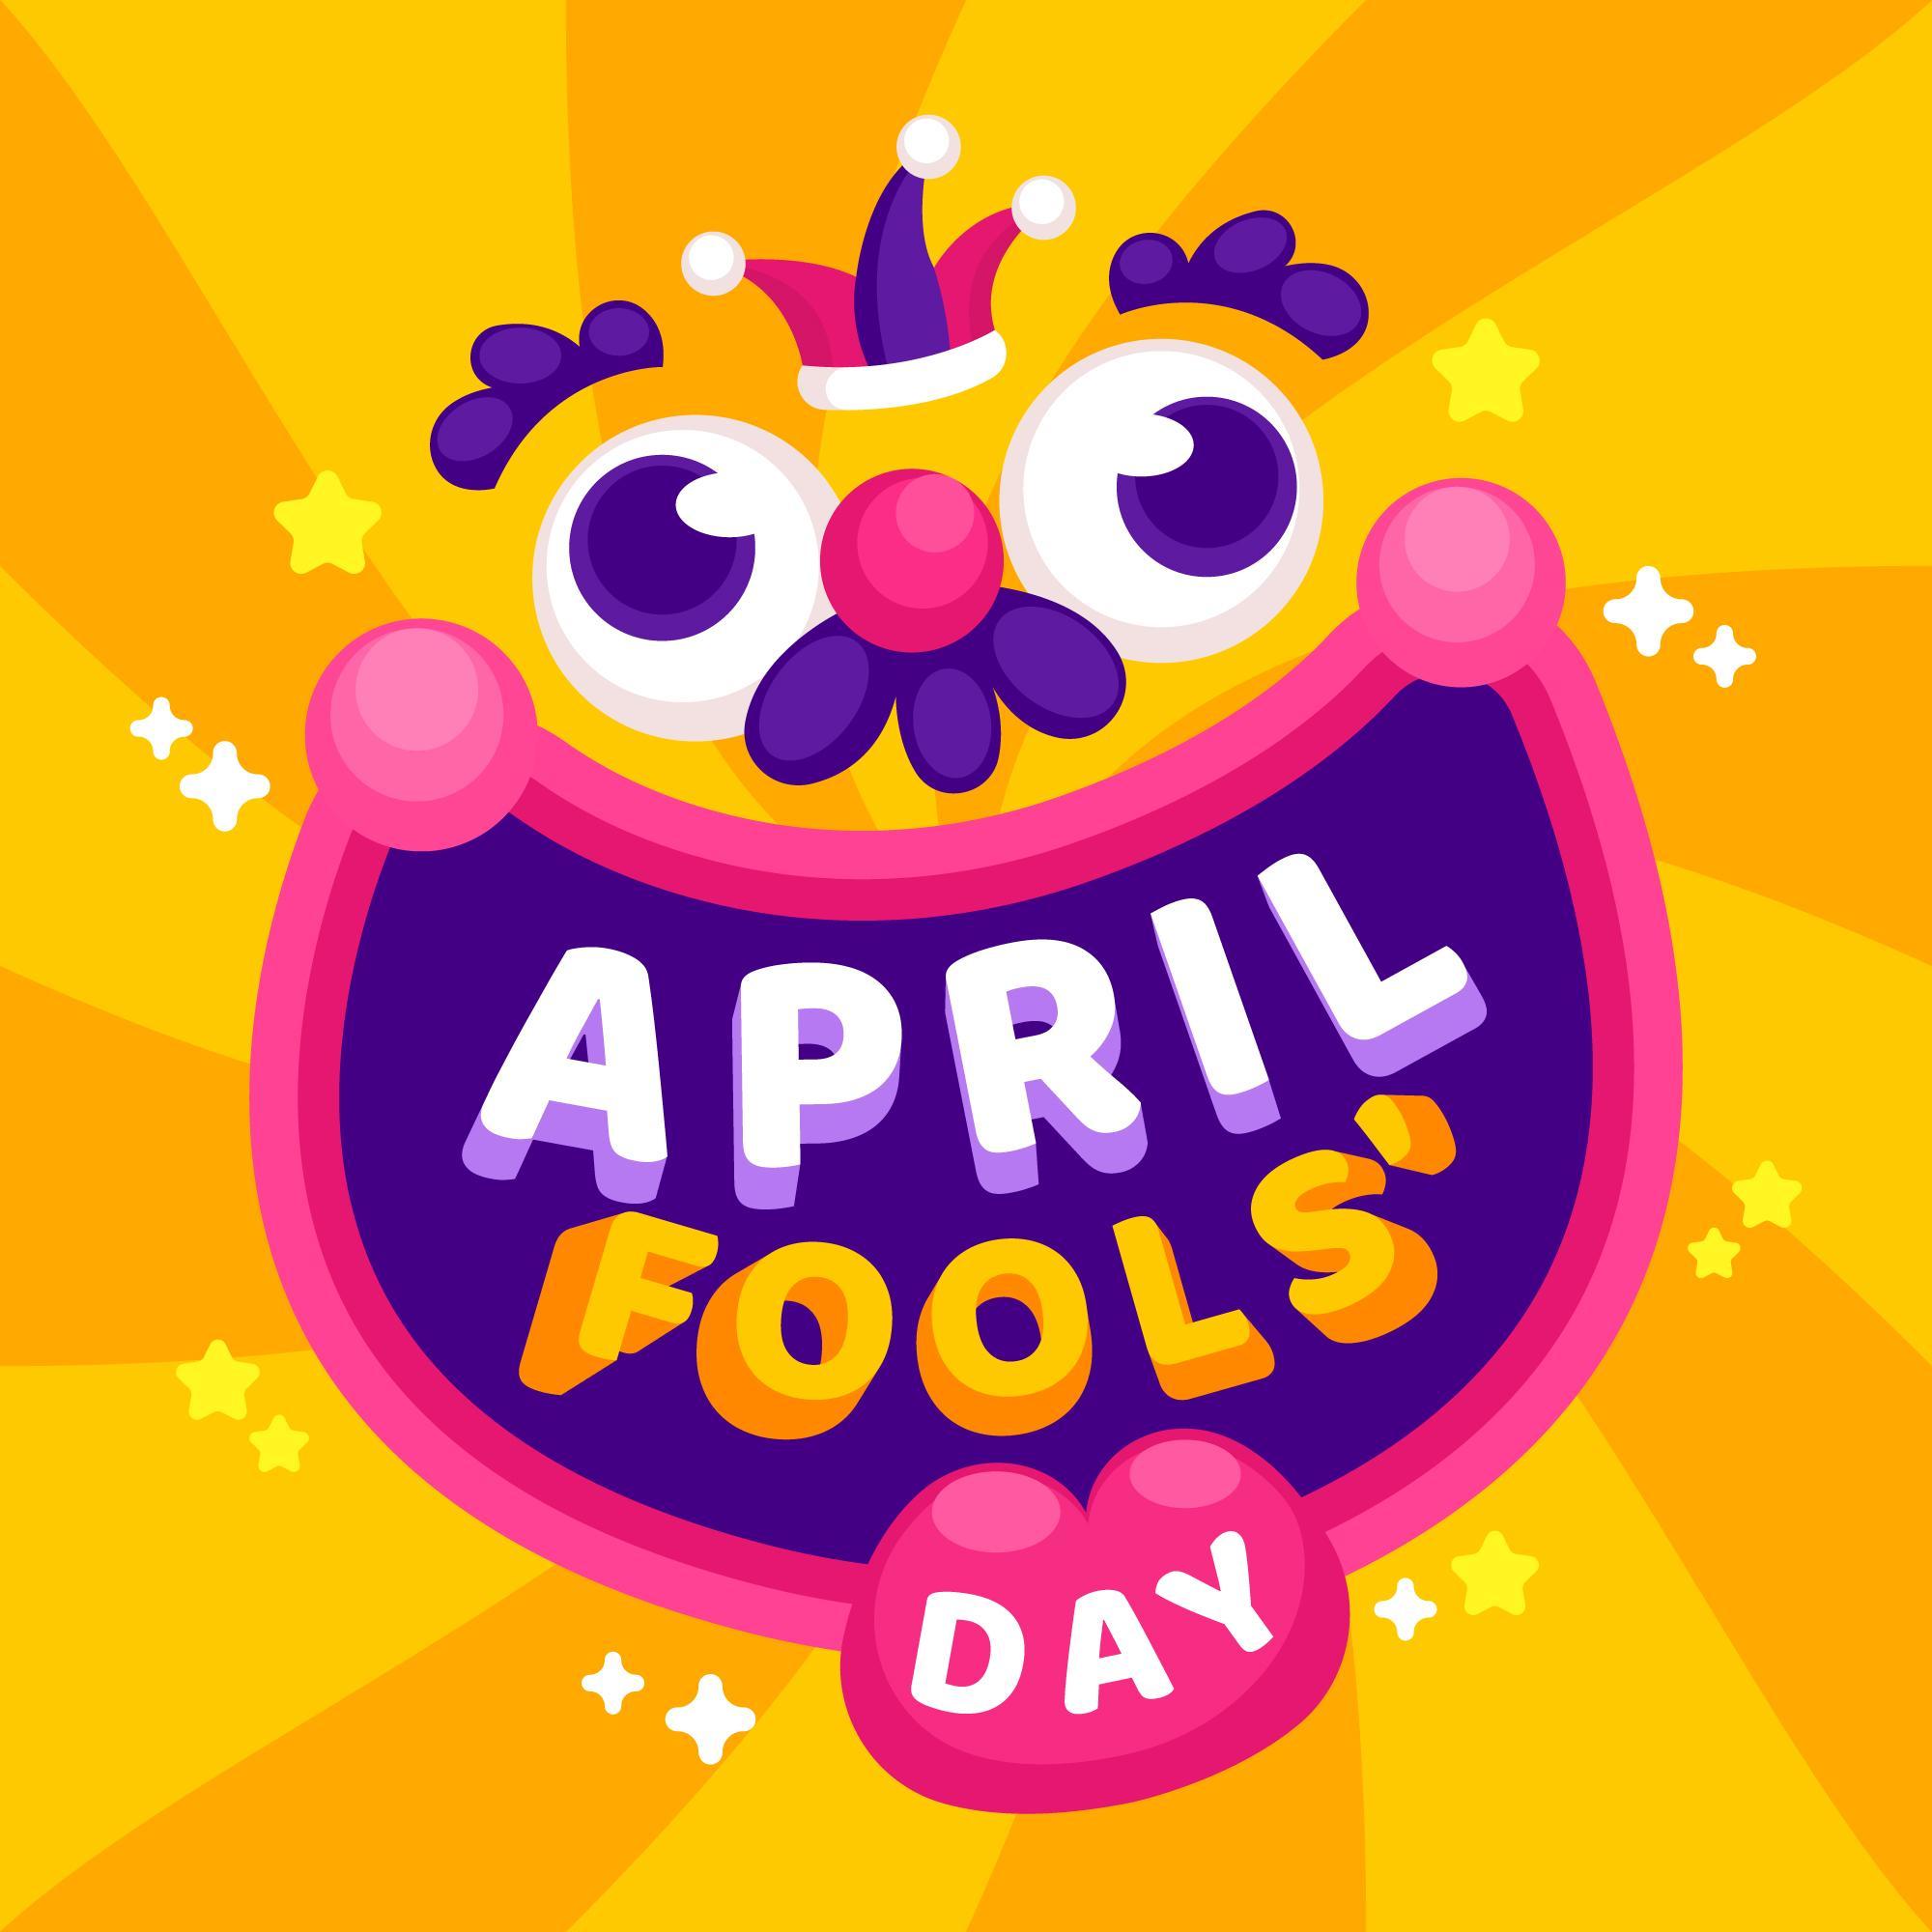 April Fool Day Image